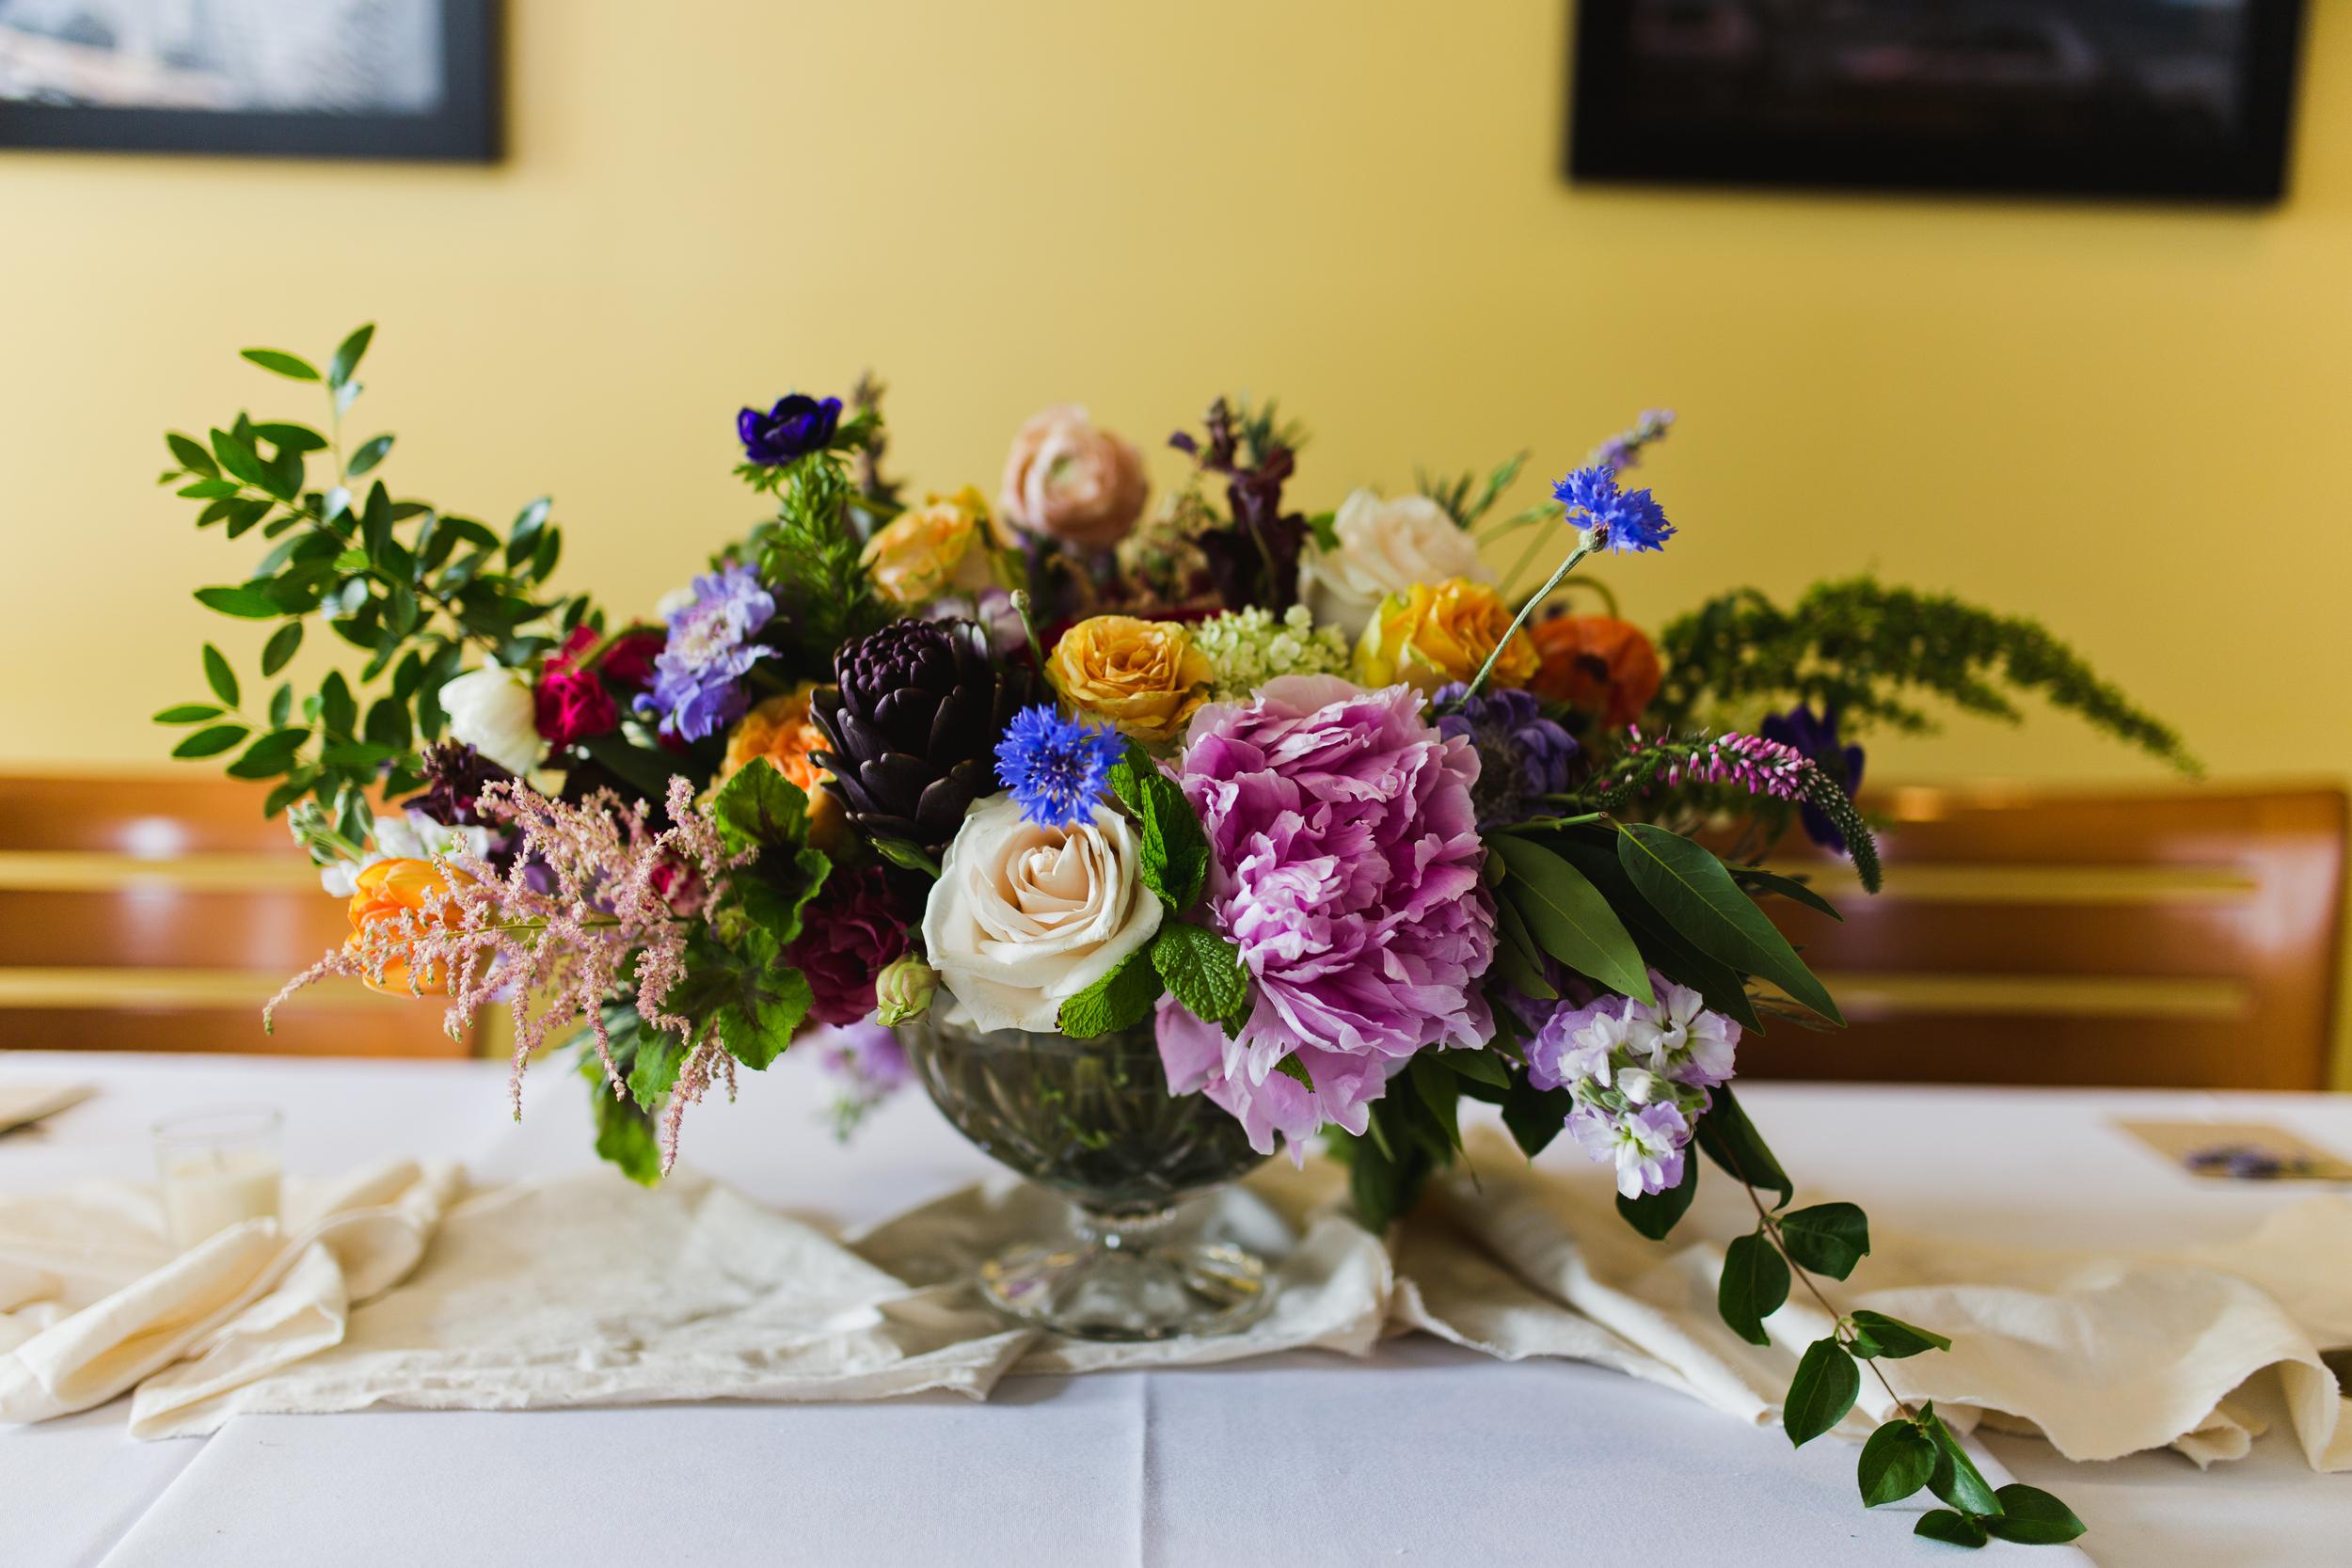 Laura+-+Birthday+-+Kristin+-+Flowers+-+Elizabeth+Hoard+Photography+(40+of+372).jpeg